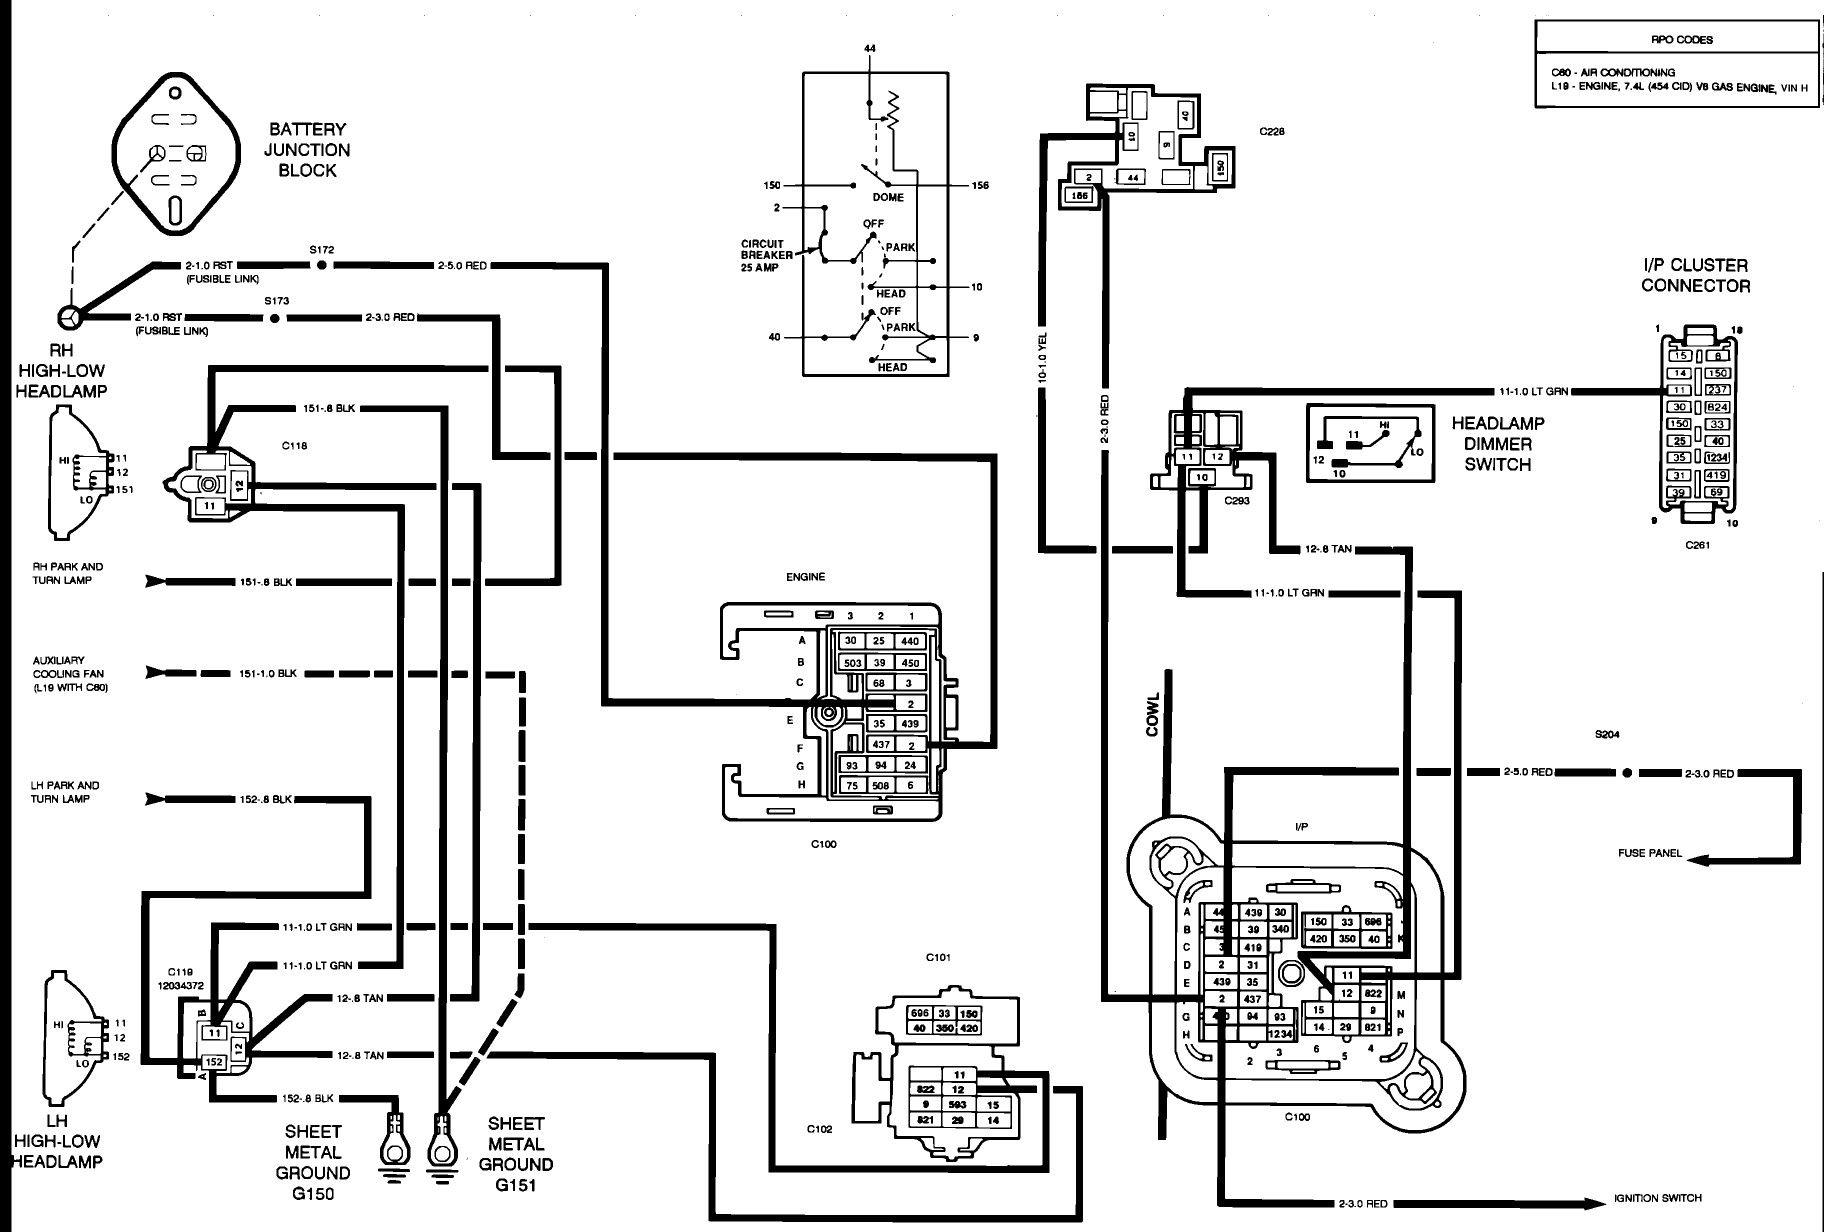 Ac Diagram Auto In 2021 Electrical Diagram Diagram Remote Car Starter